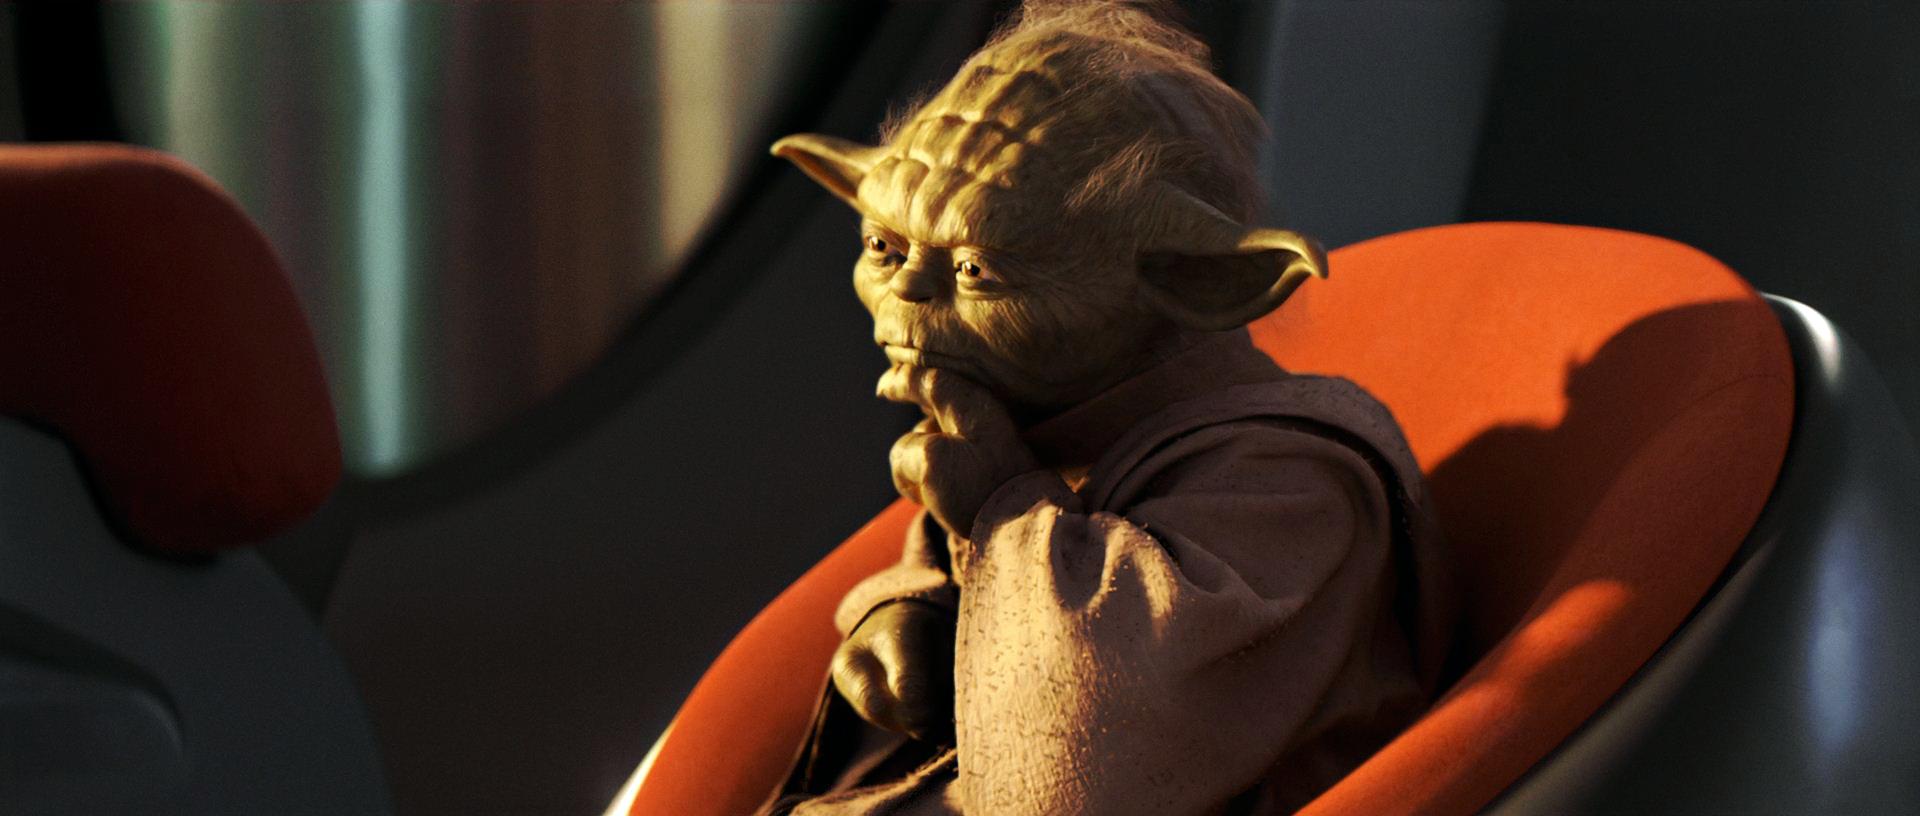 Файл:Yoda Episode I Canon.png